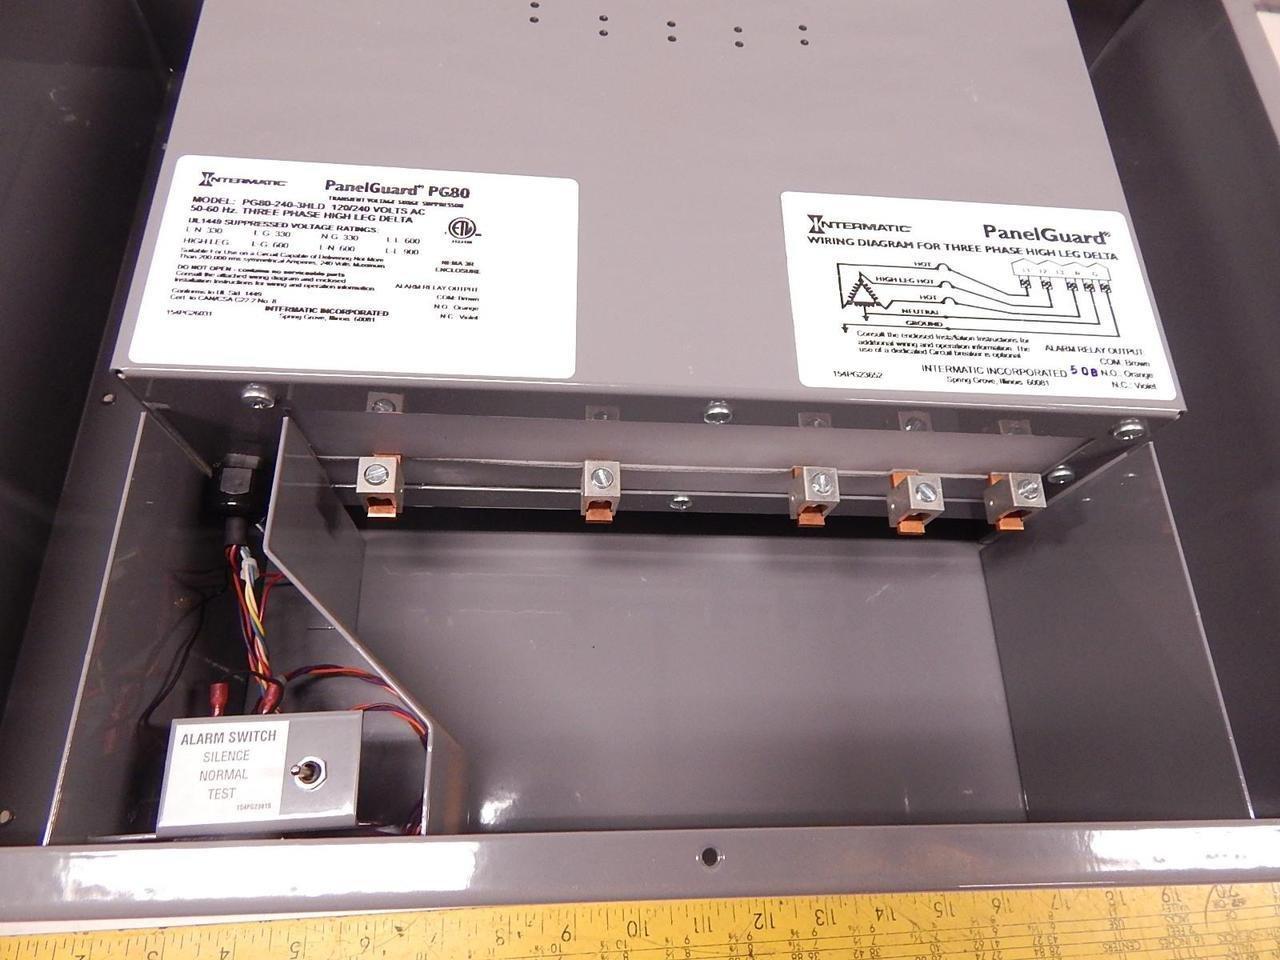 Intermatic Pg80 240 3hld Panelguard Transient Voltage Surge X8 Wiring Diagram Suppressor 120 Vac Industrial Scientific